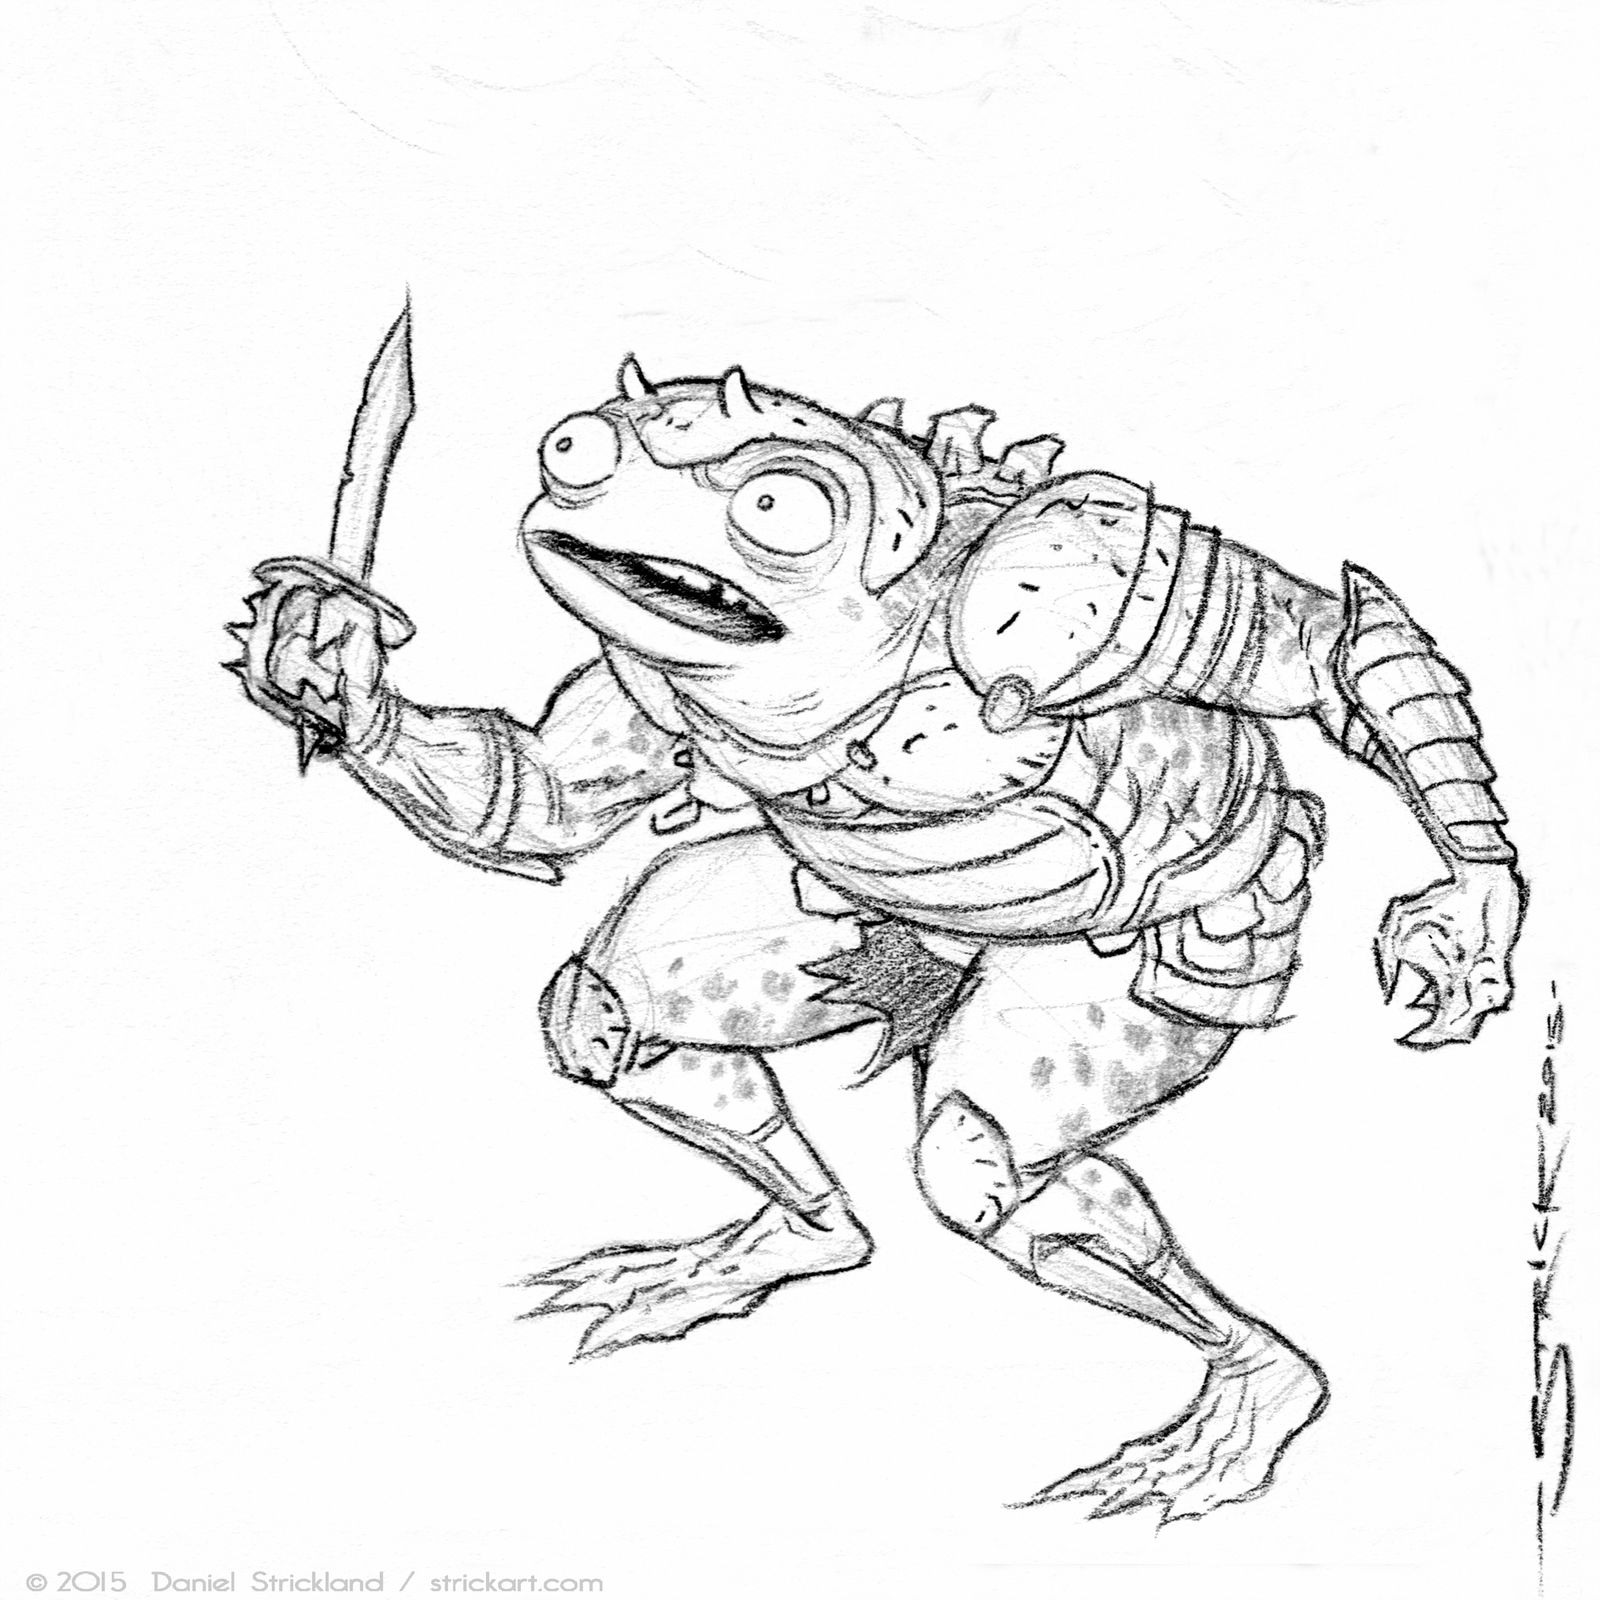 Frog Soldier sketch 4 by strickart